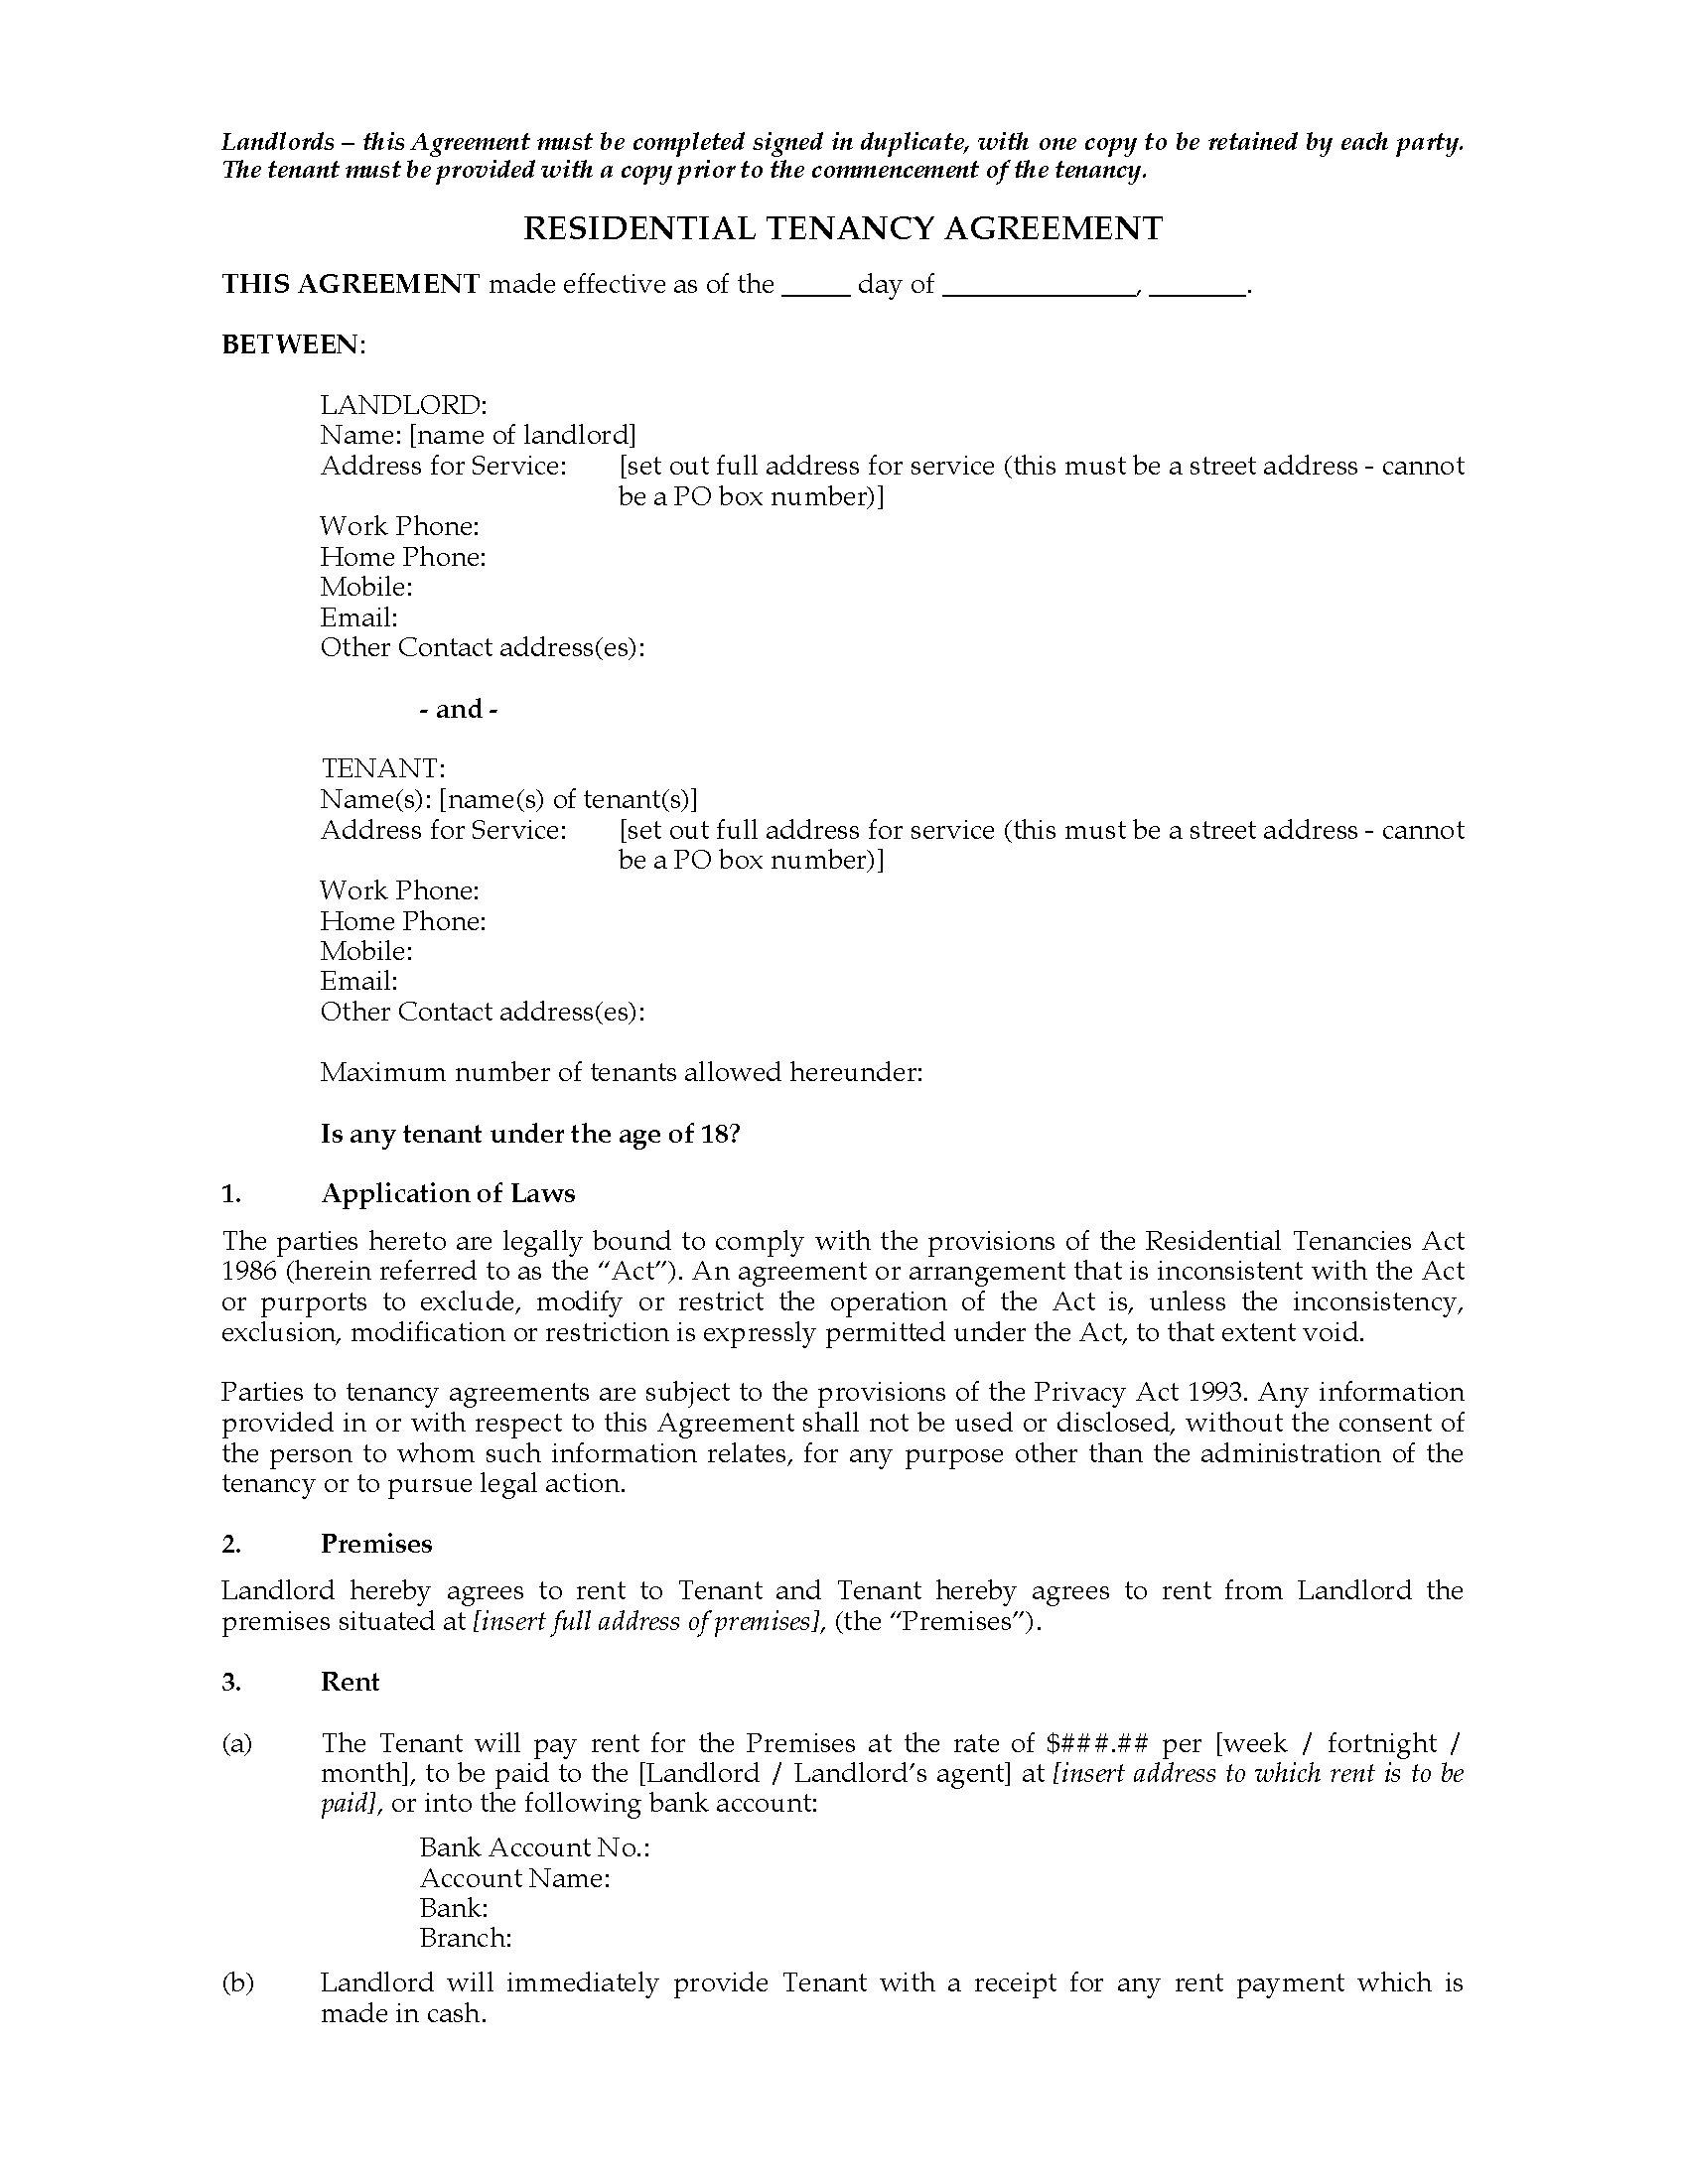 Residential Tenancy Application Form Manitoba